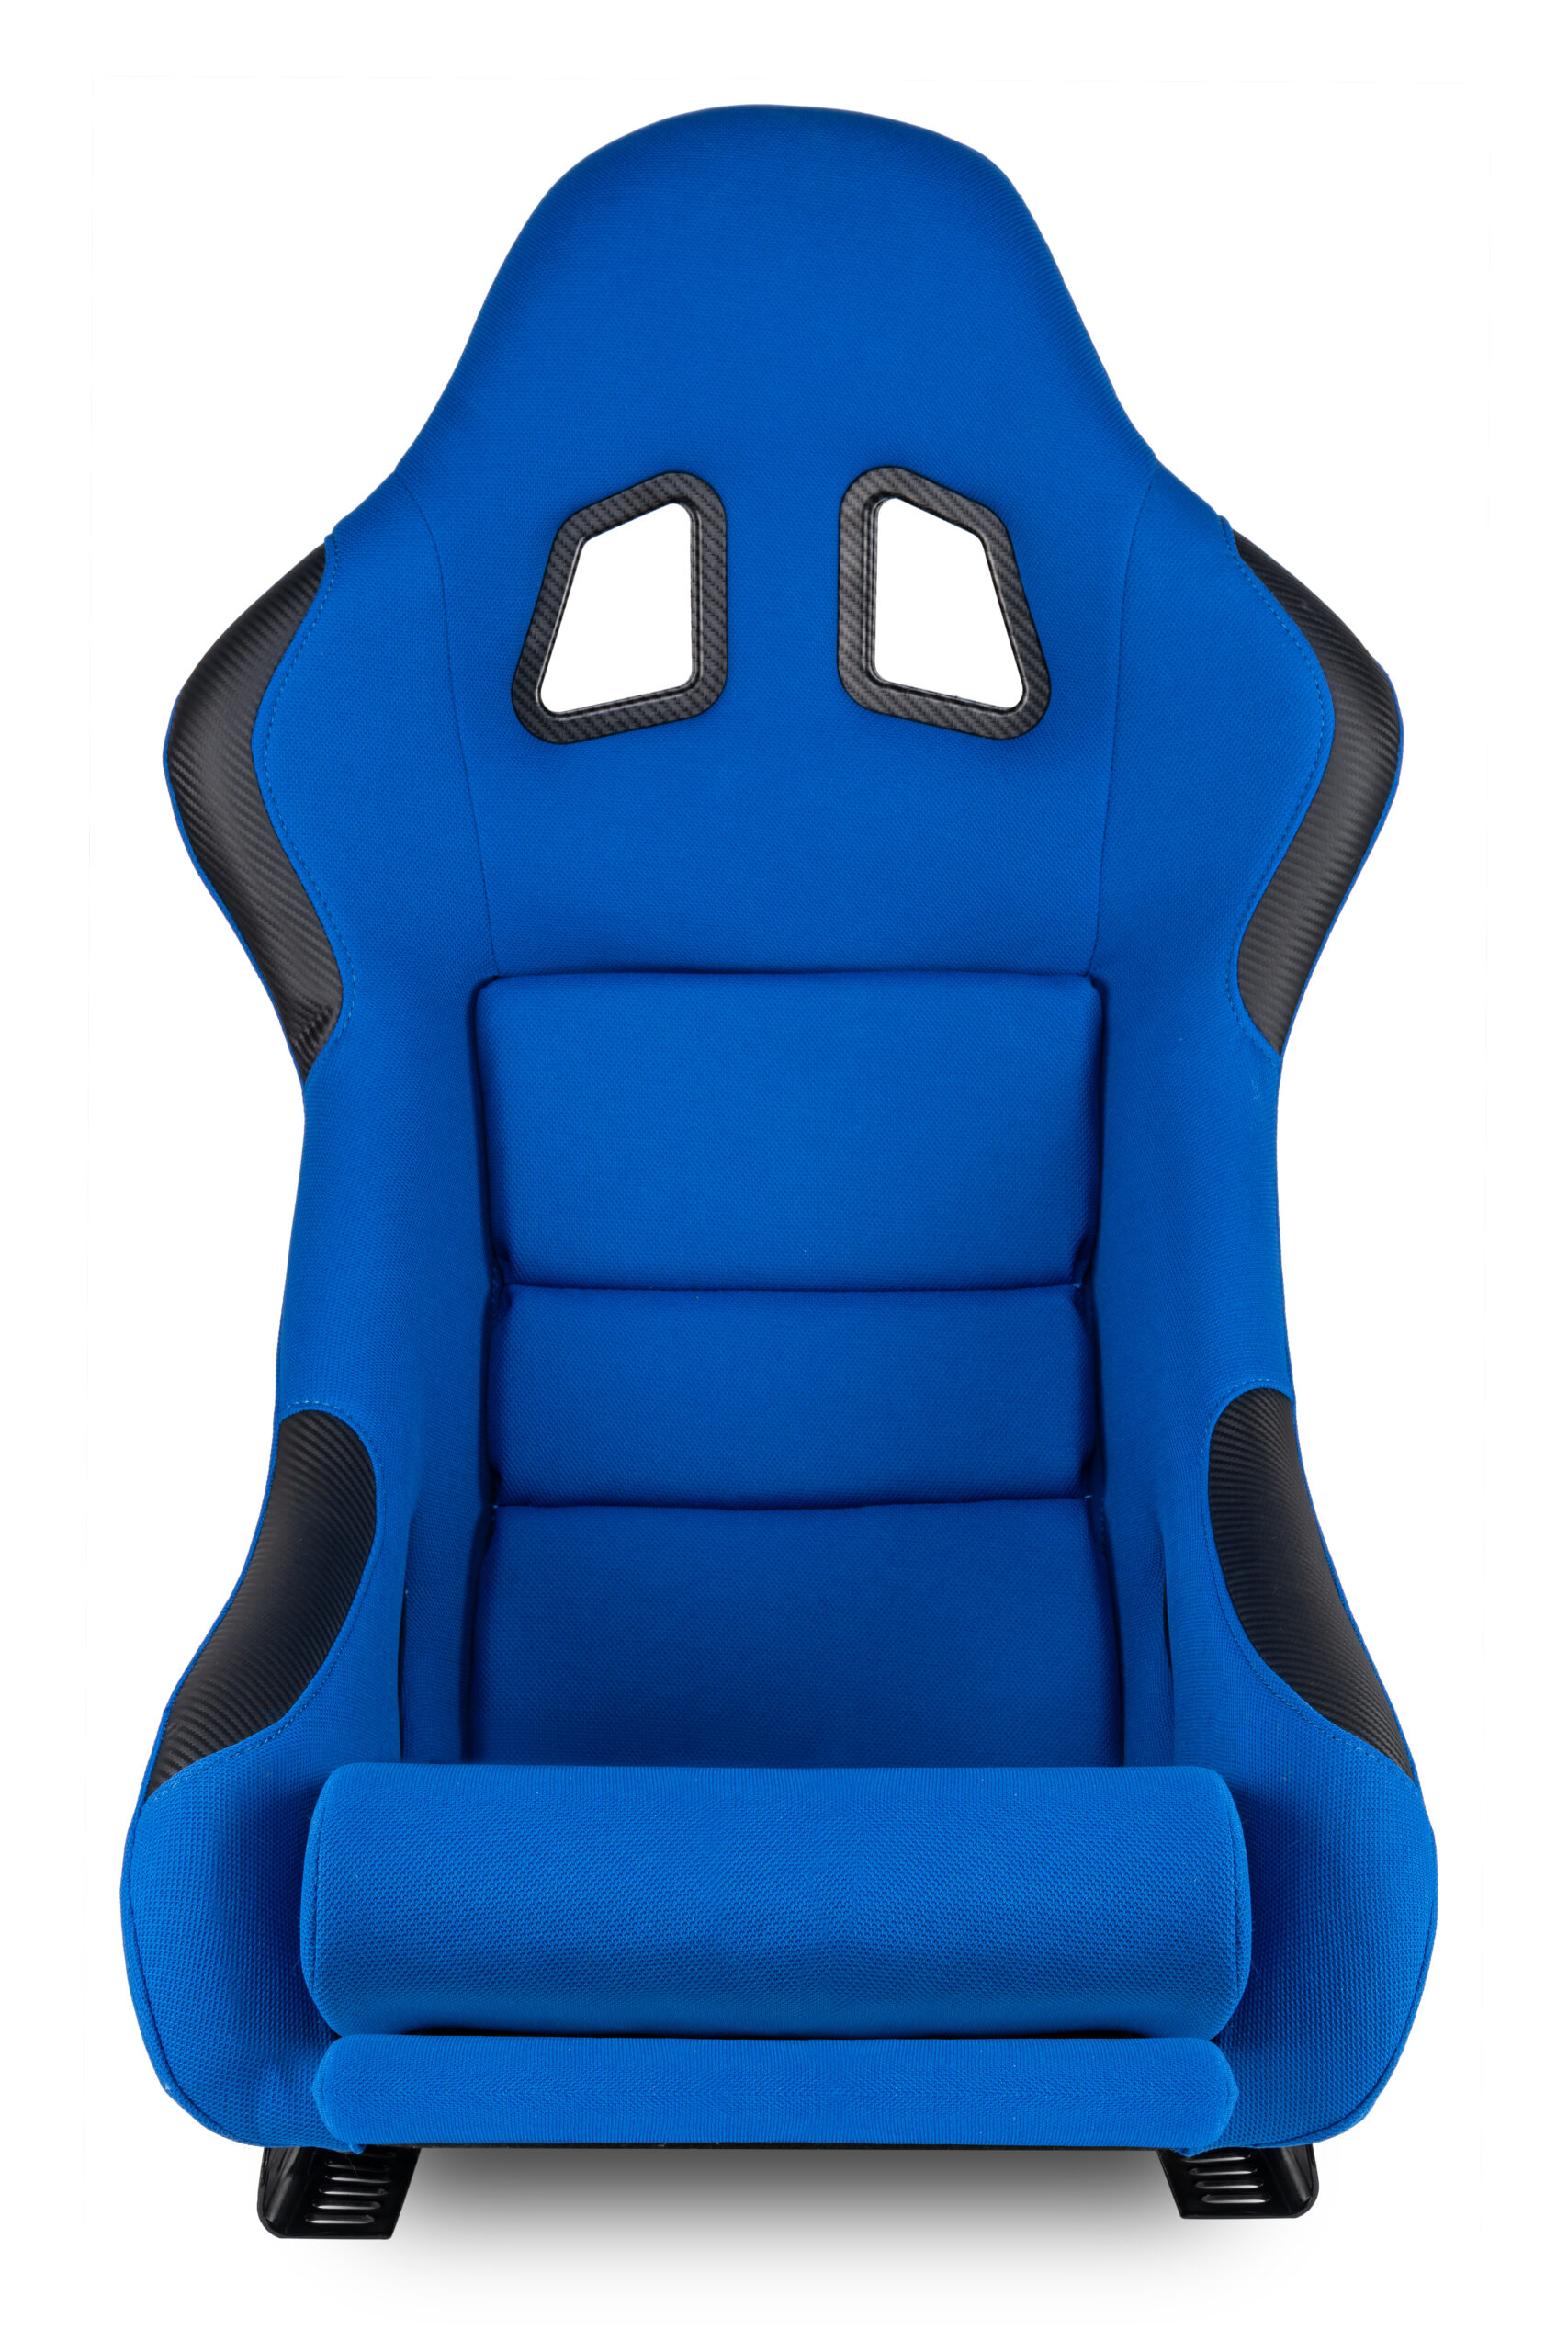 blue black carbon fiber motorsport race car tuning sim racing bucket seat isolated white background